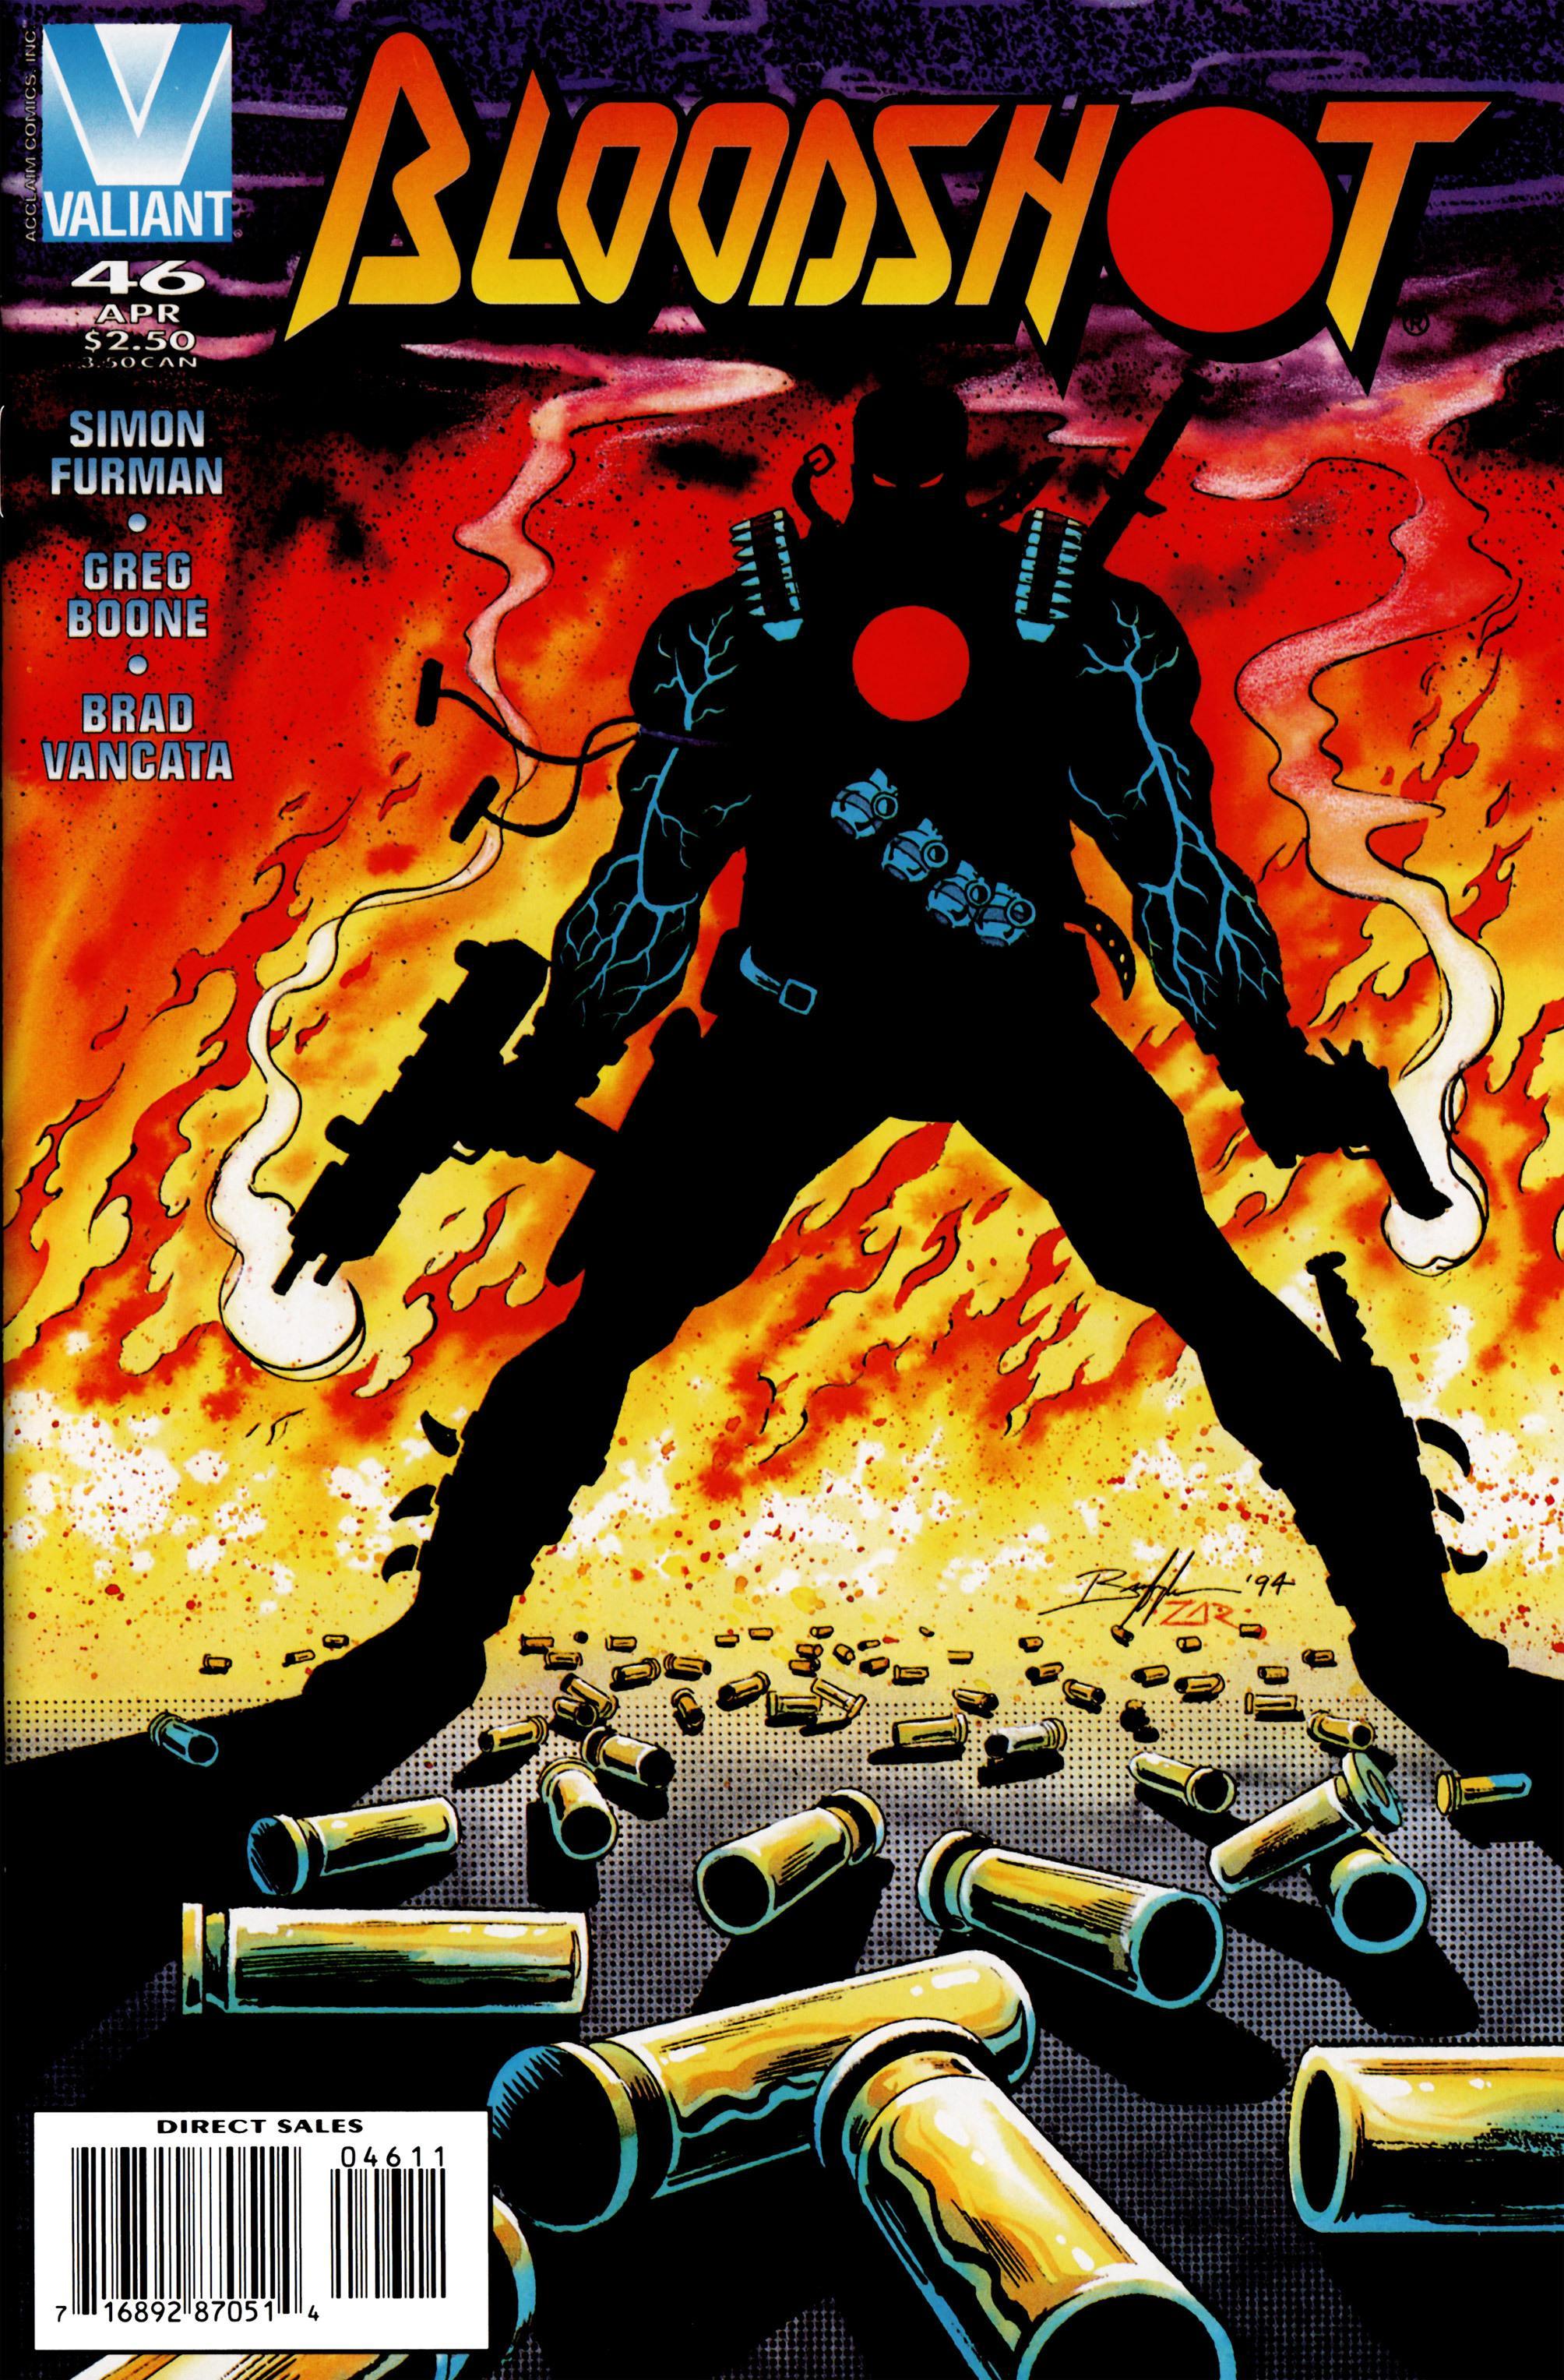 Bloodshot Vol 1 46